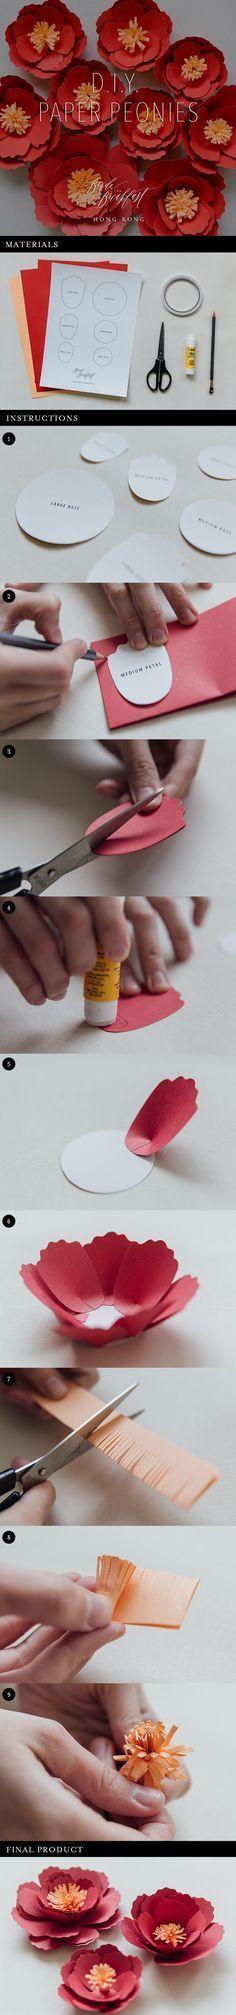 DIY Paper Peonies | Paper Craft | Paper Flowers | Wedding Decor | Free Printable Template